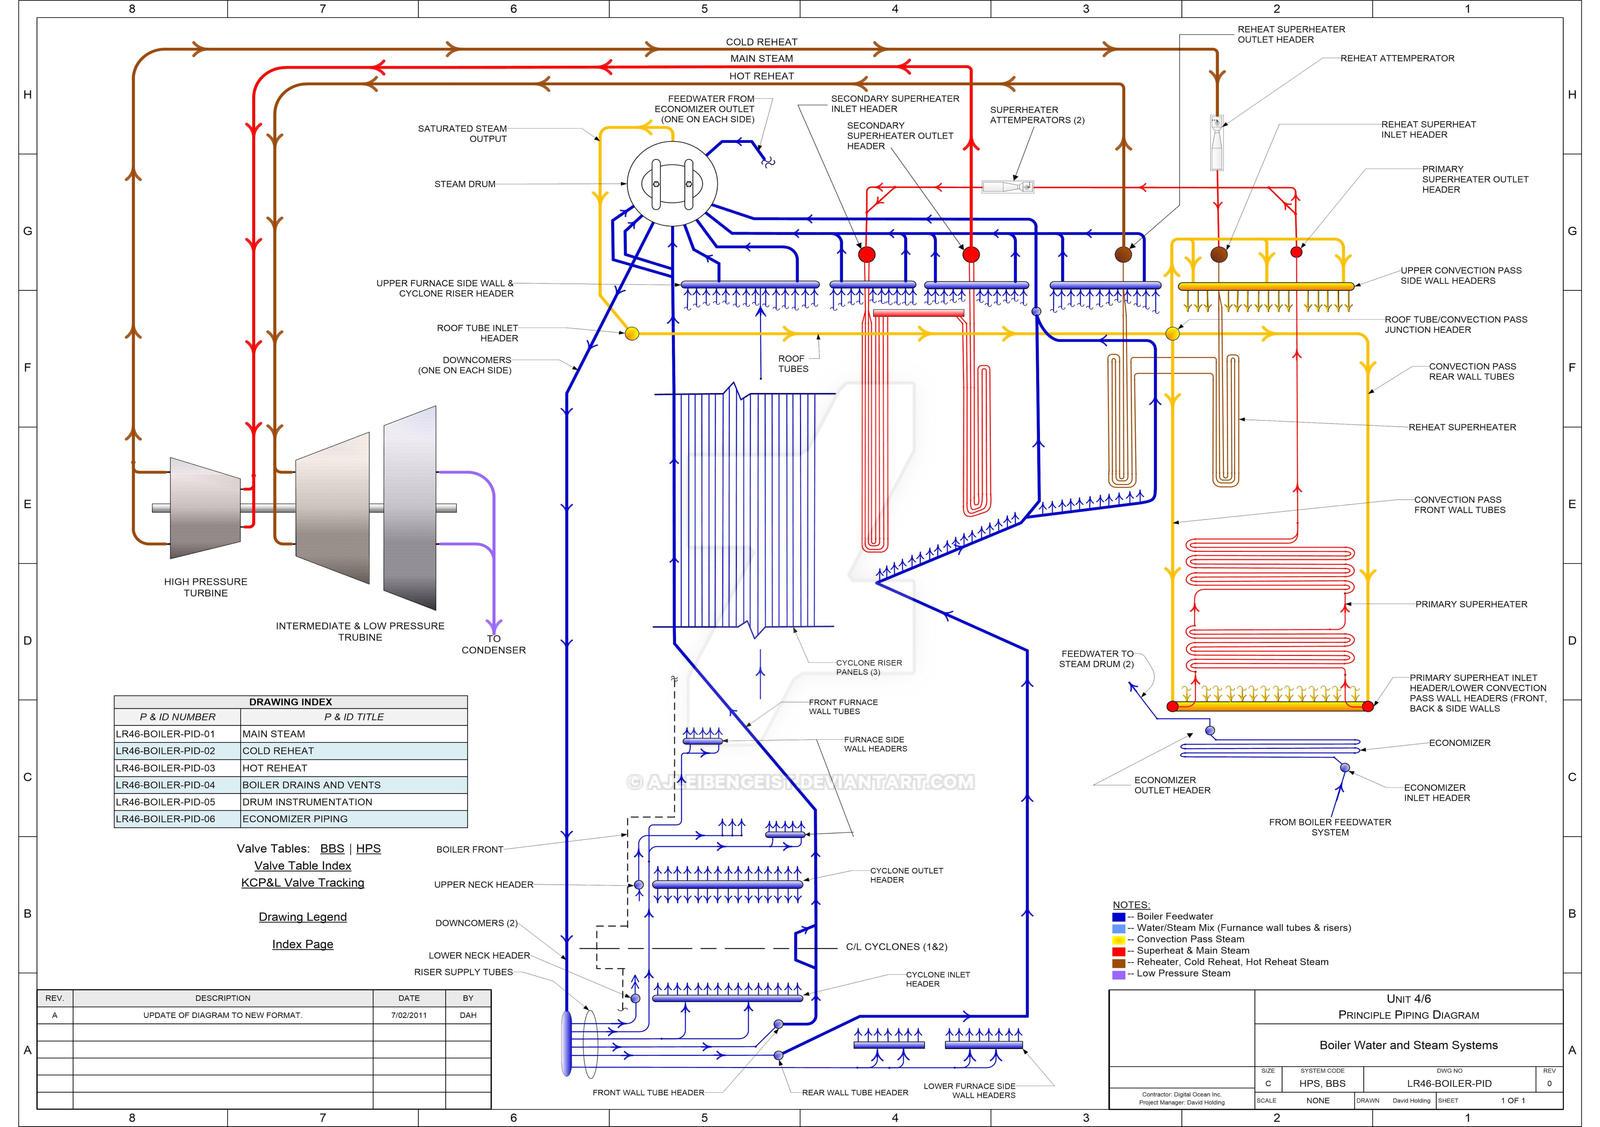 Lr46-boiler-pid by AJLeibengeist